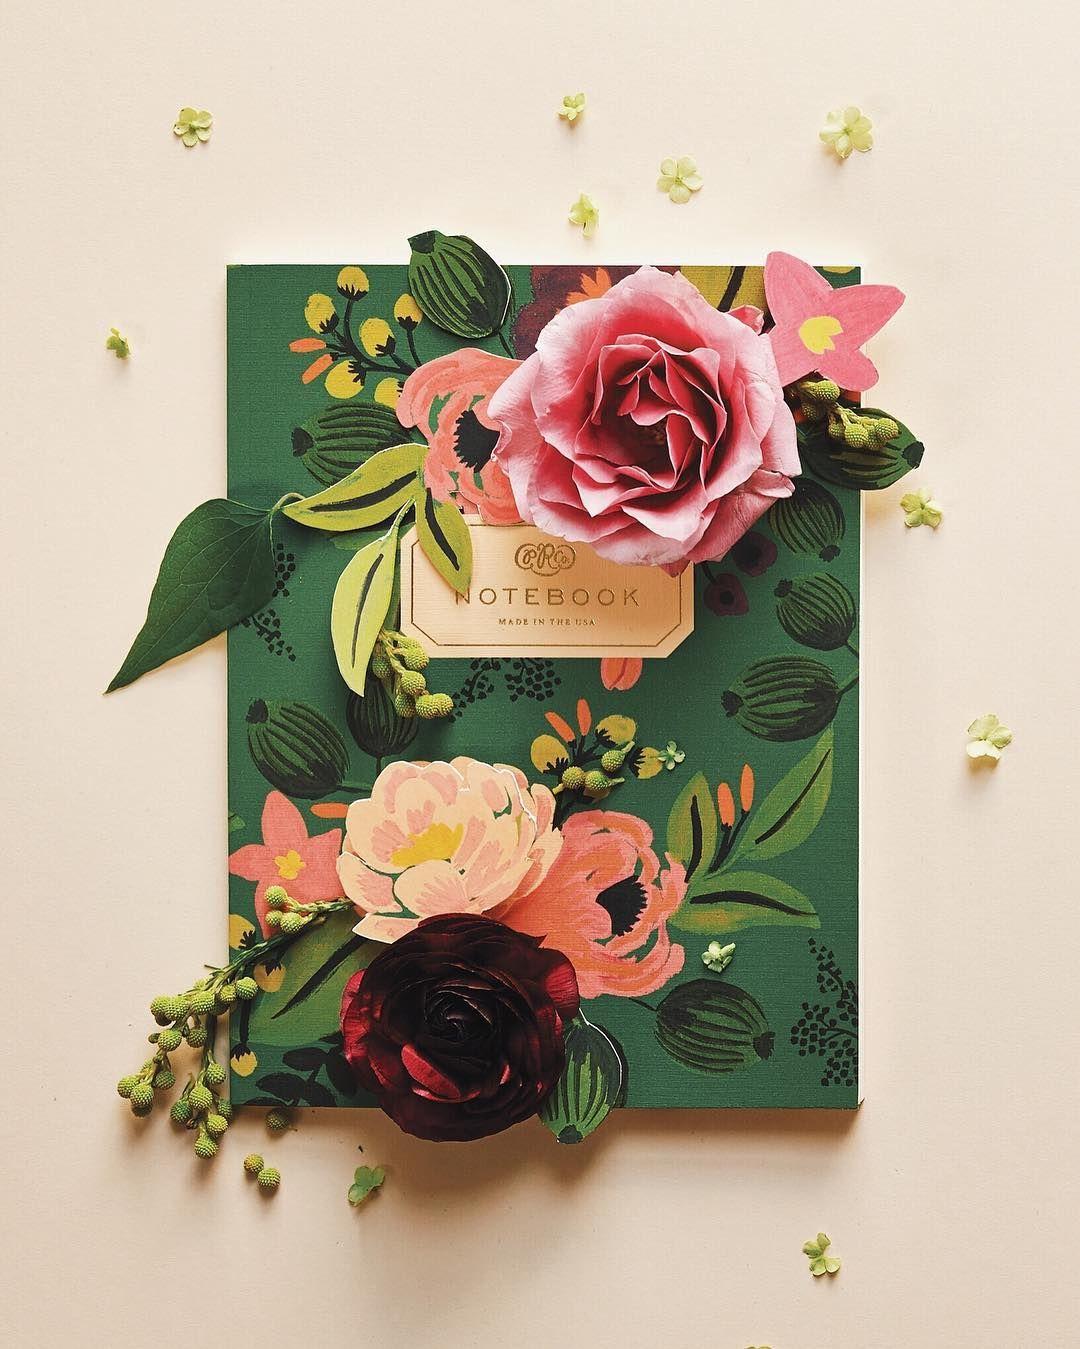 anna rifle bond notebook pink roses and garden inspiration